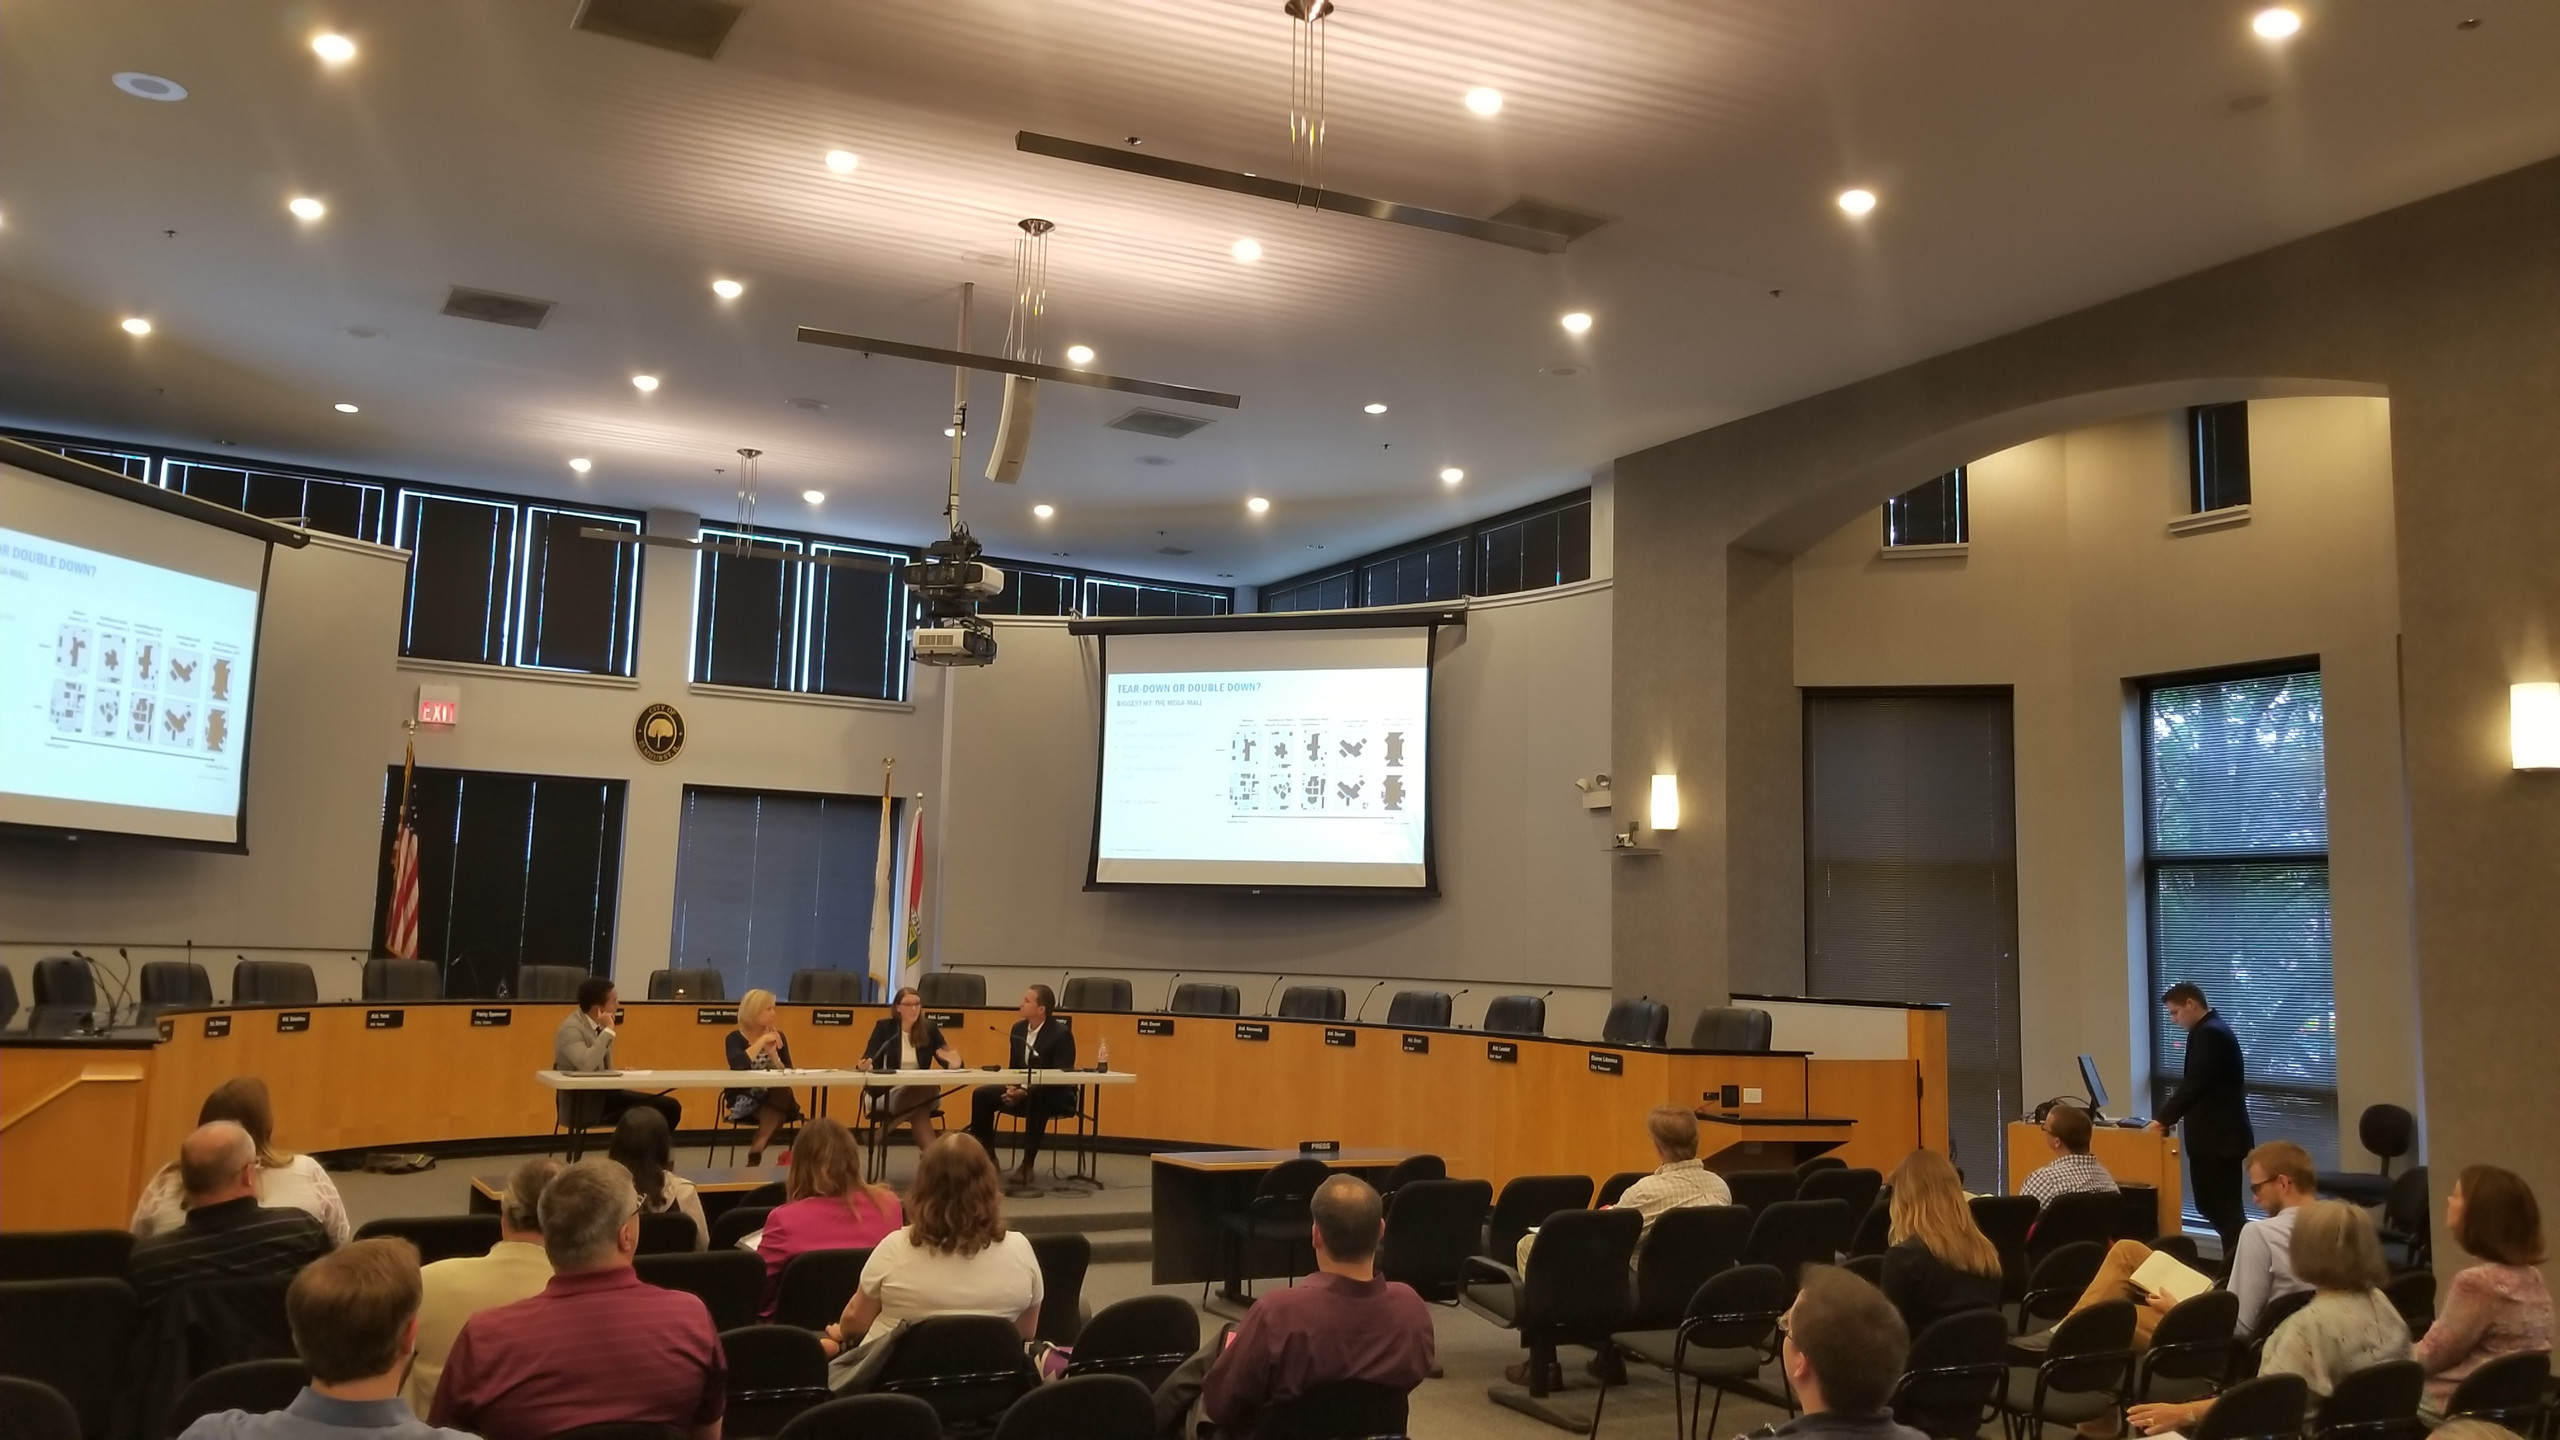 E-Commerce & Vibrant Communities program 6/21/18 at the City of Elmhurst (photo by Drew Awsumb, AICP)